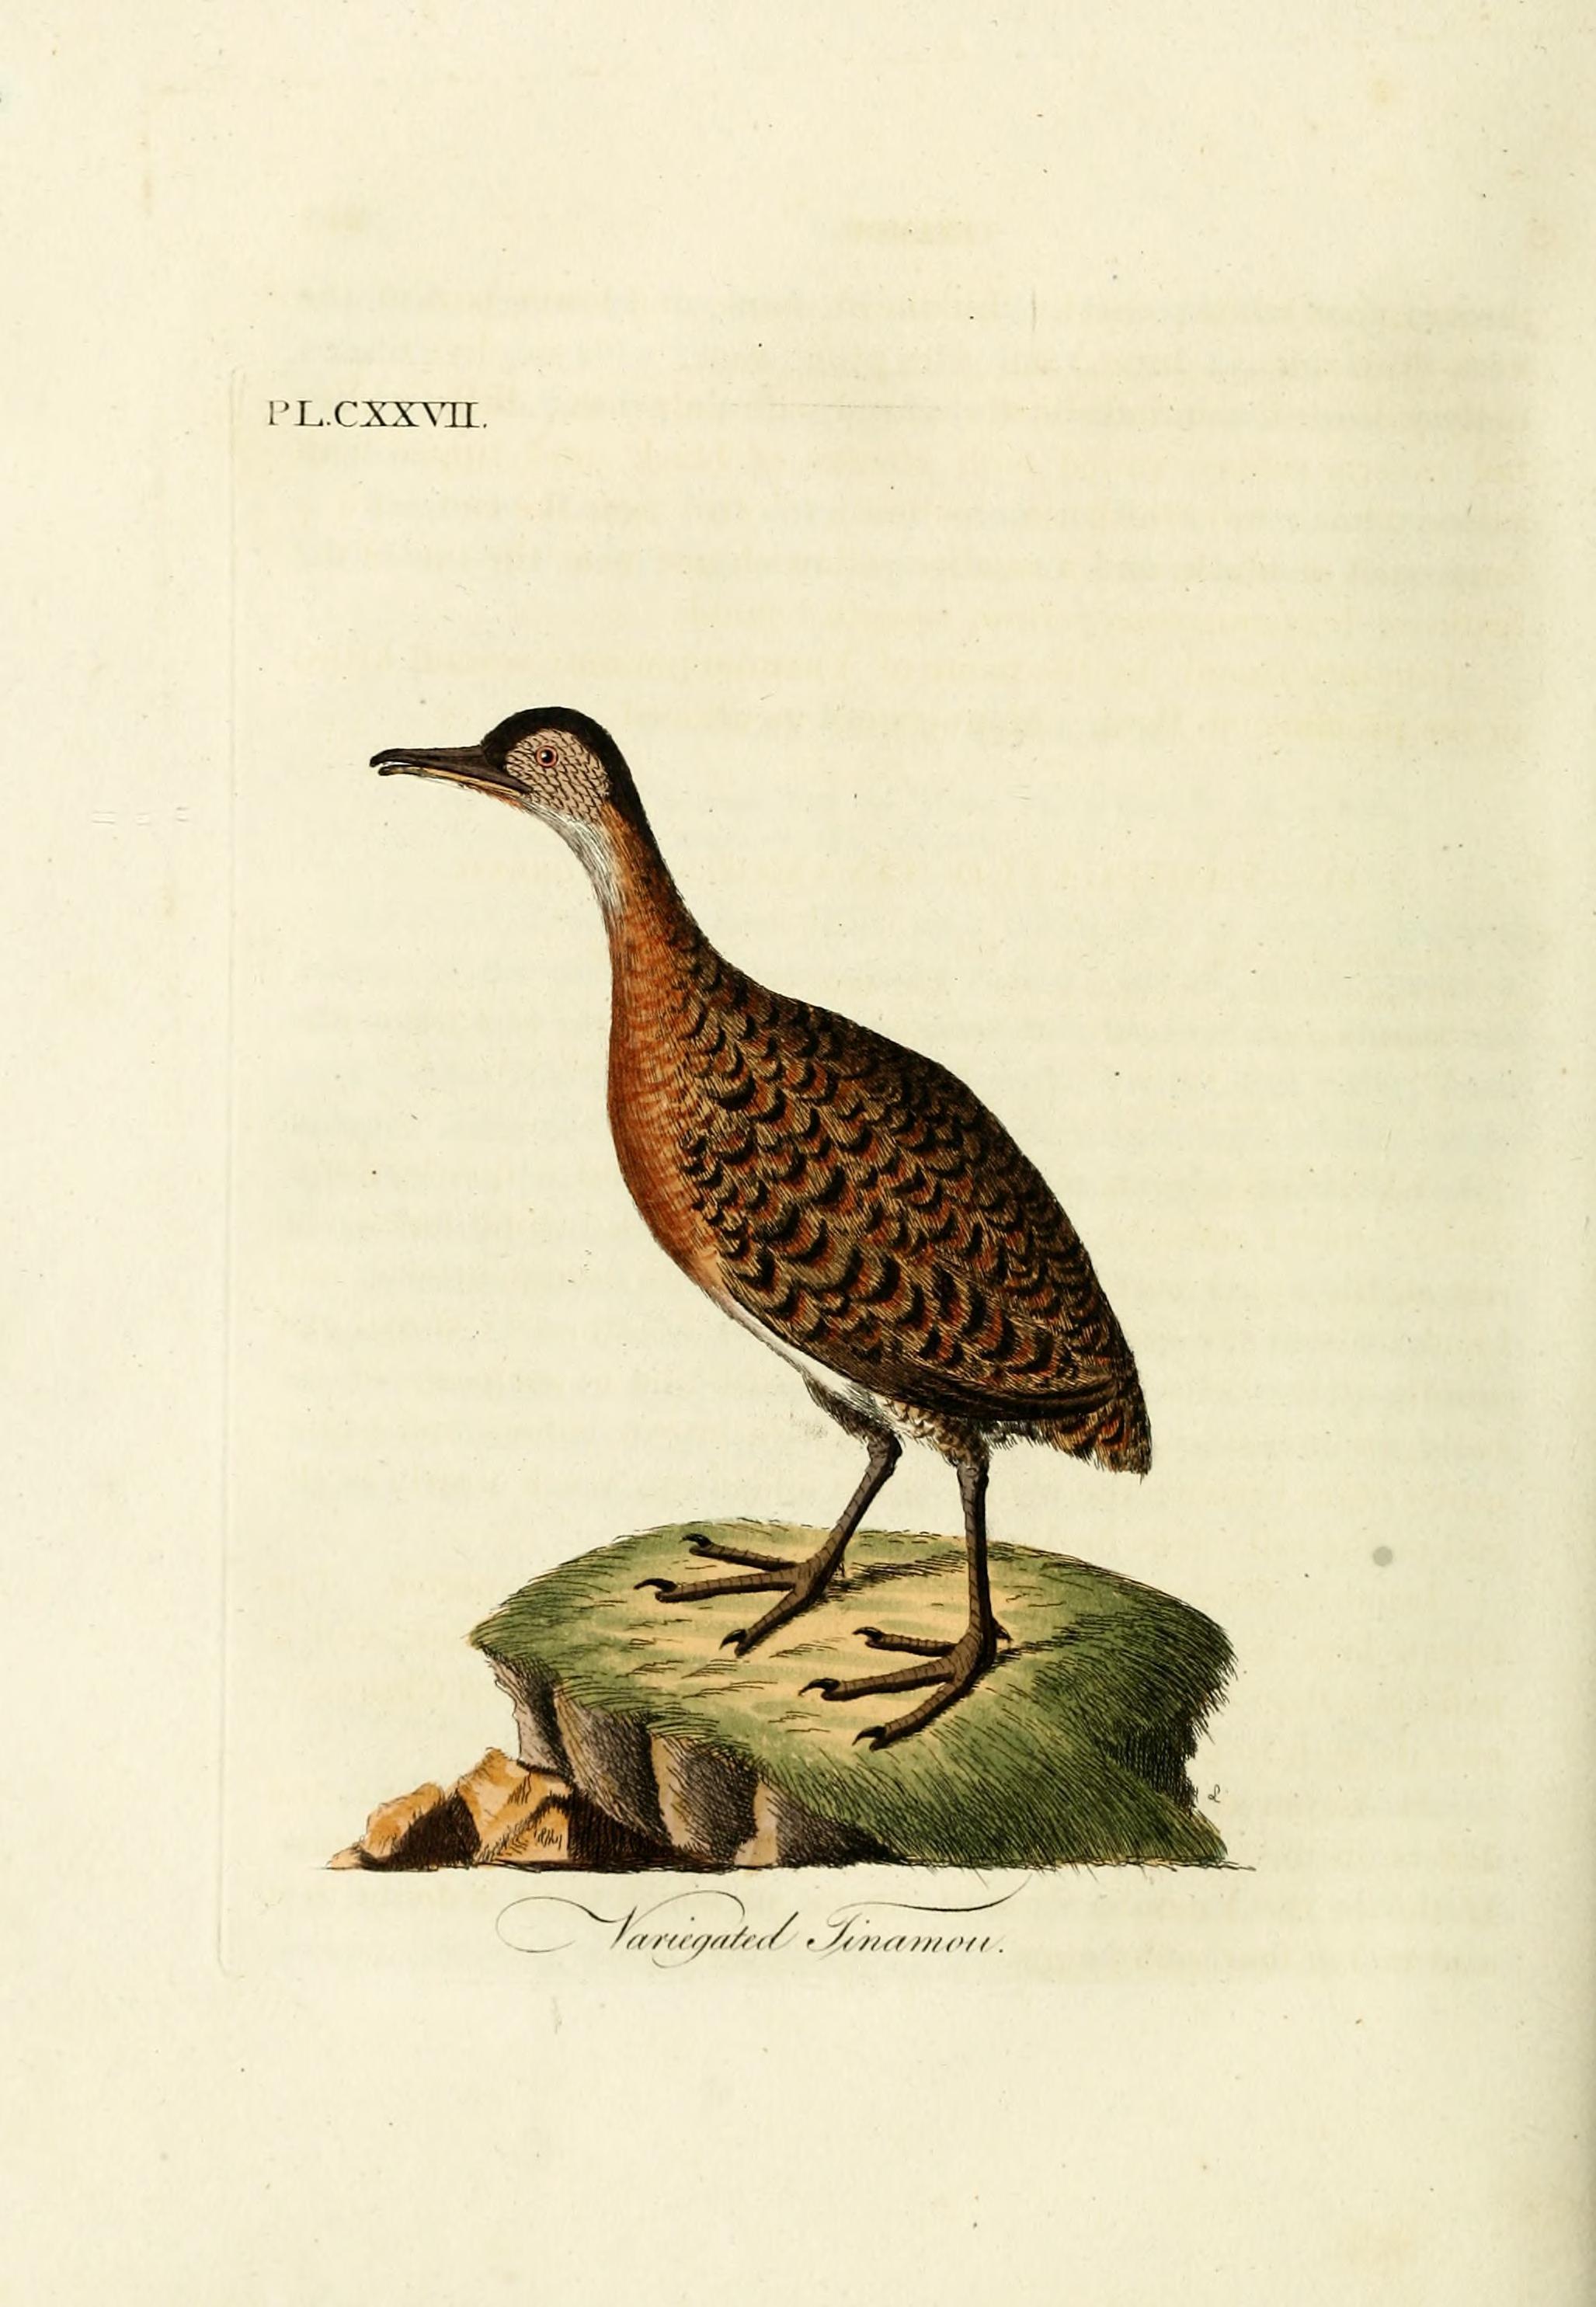 Image of Variegated Tinamou